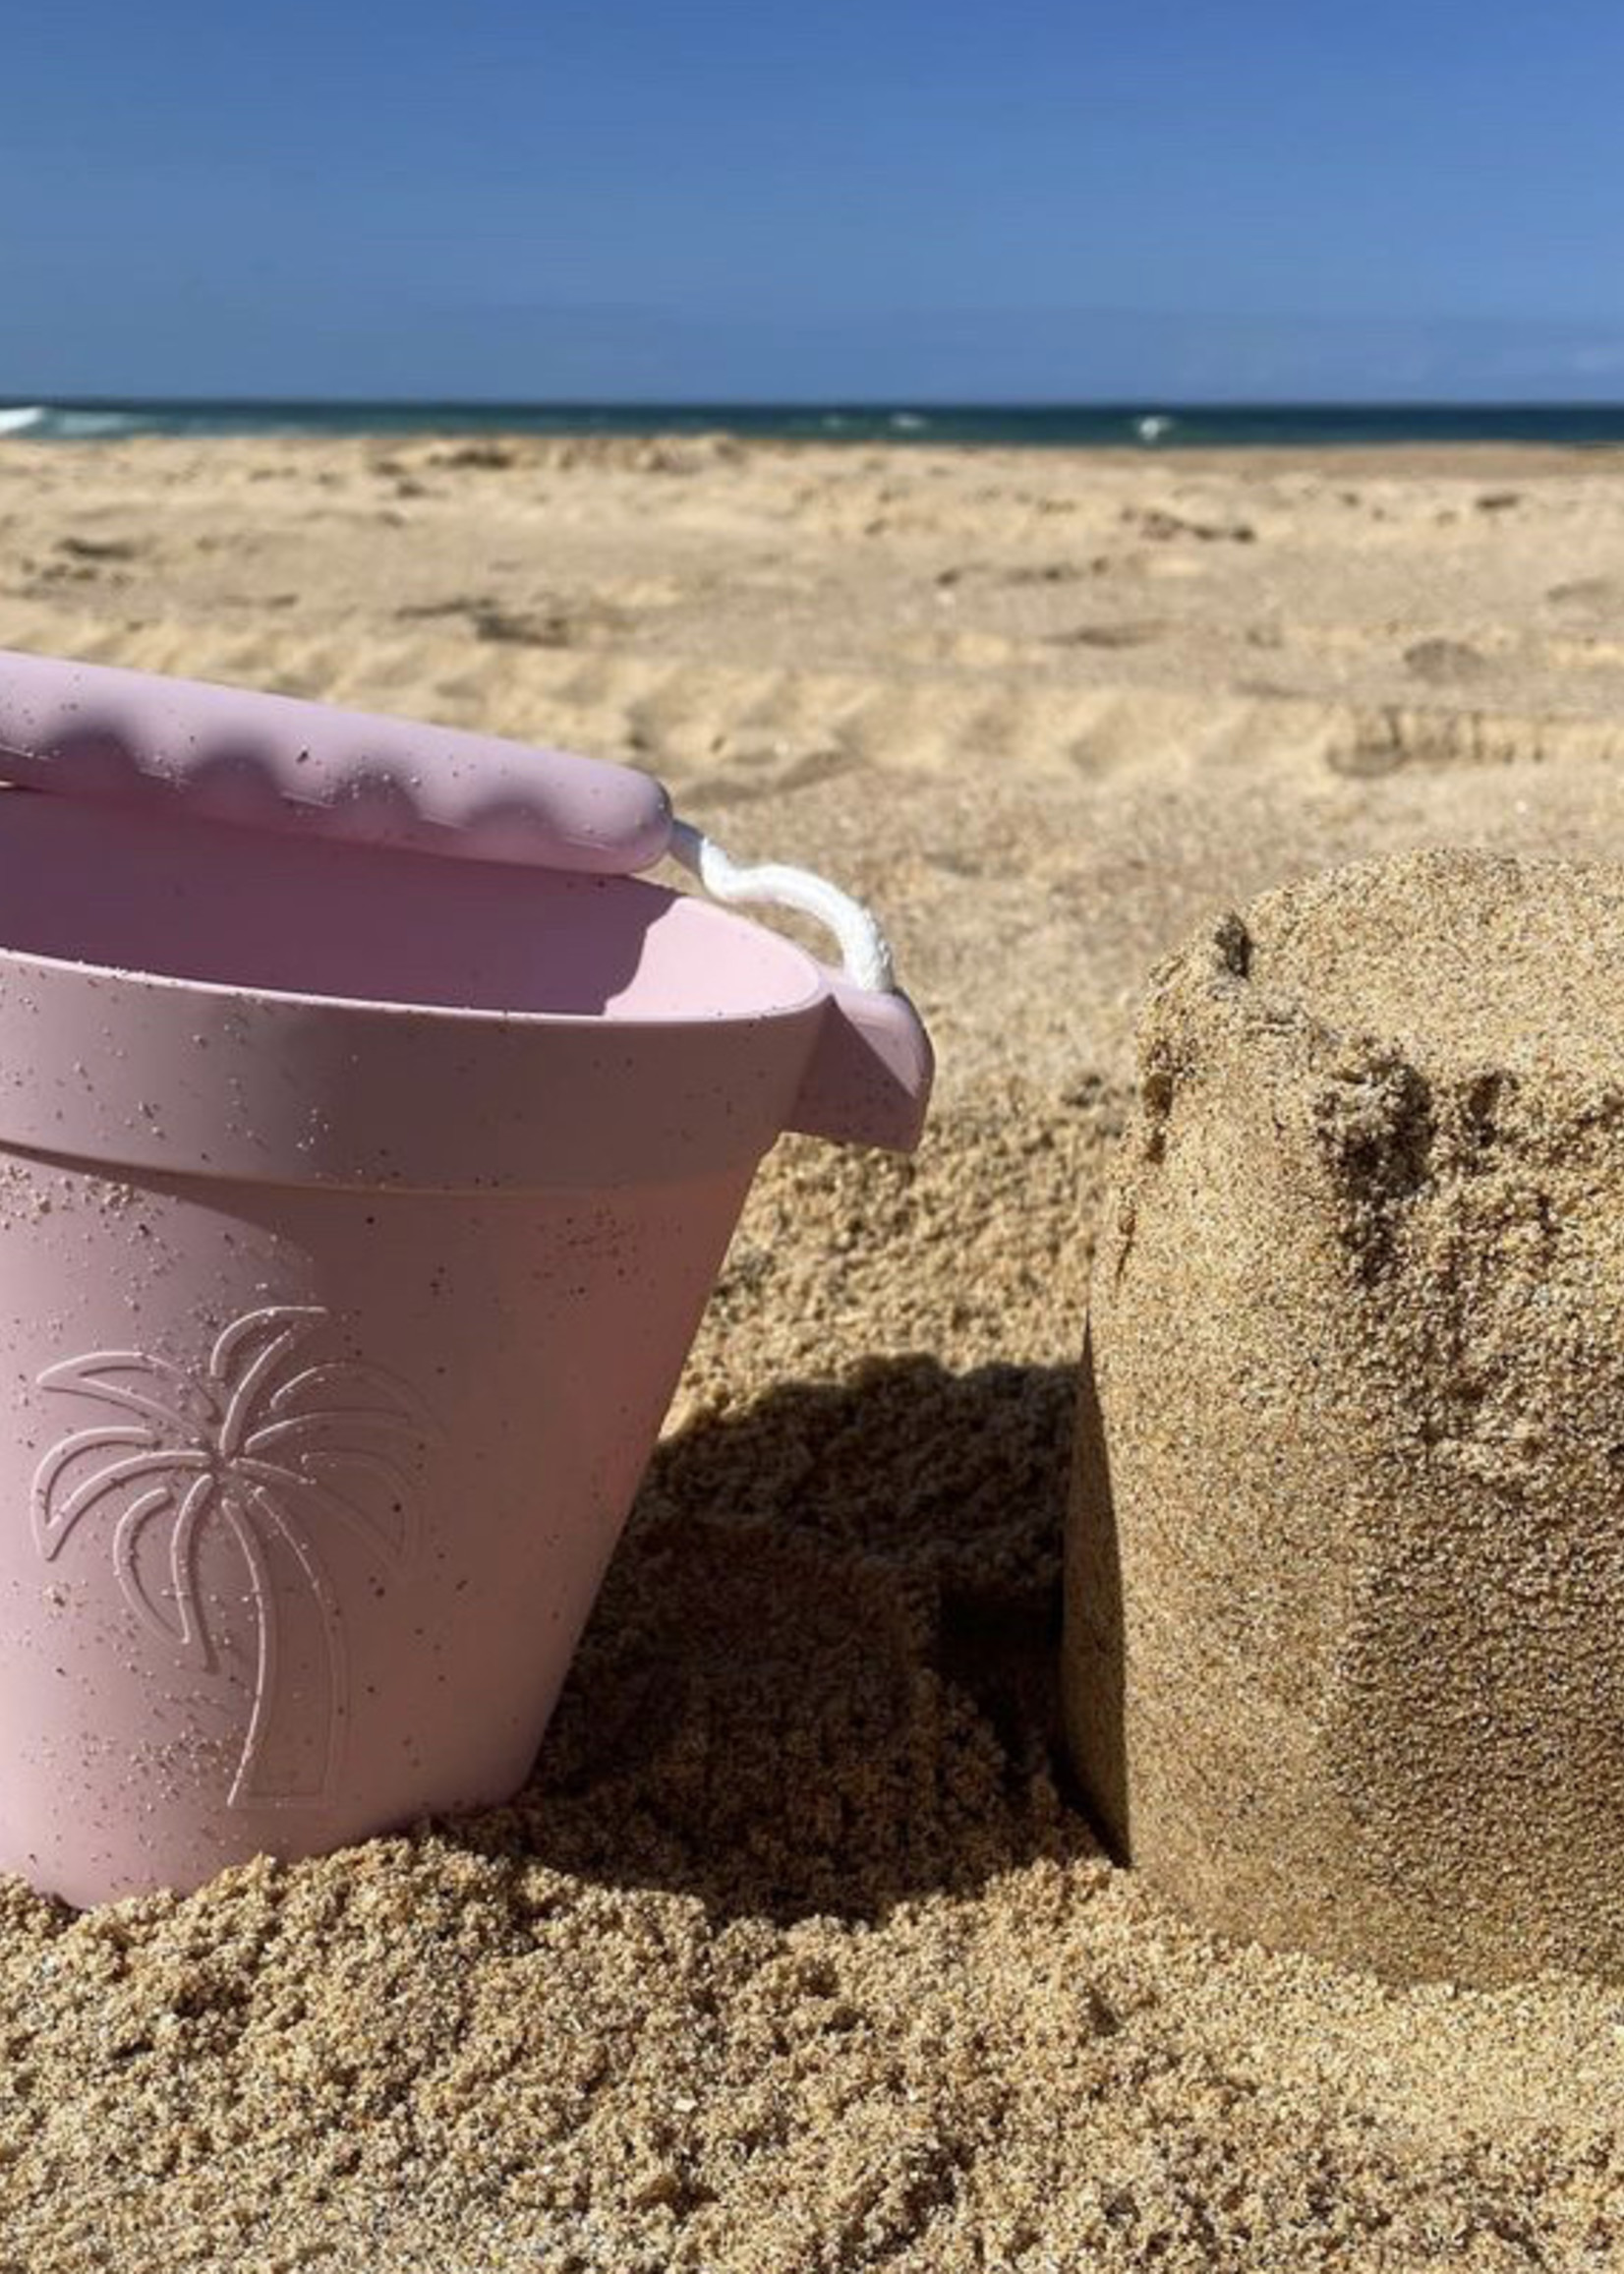 Coast Kids Aus Palm Beach Bucket & Shovel Set, lavender